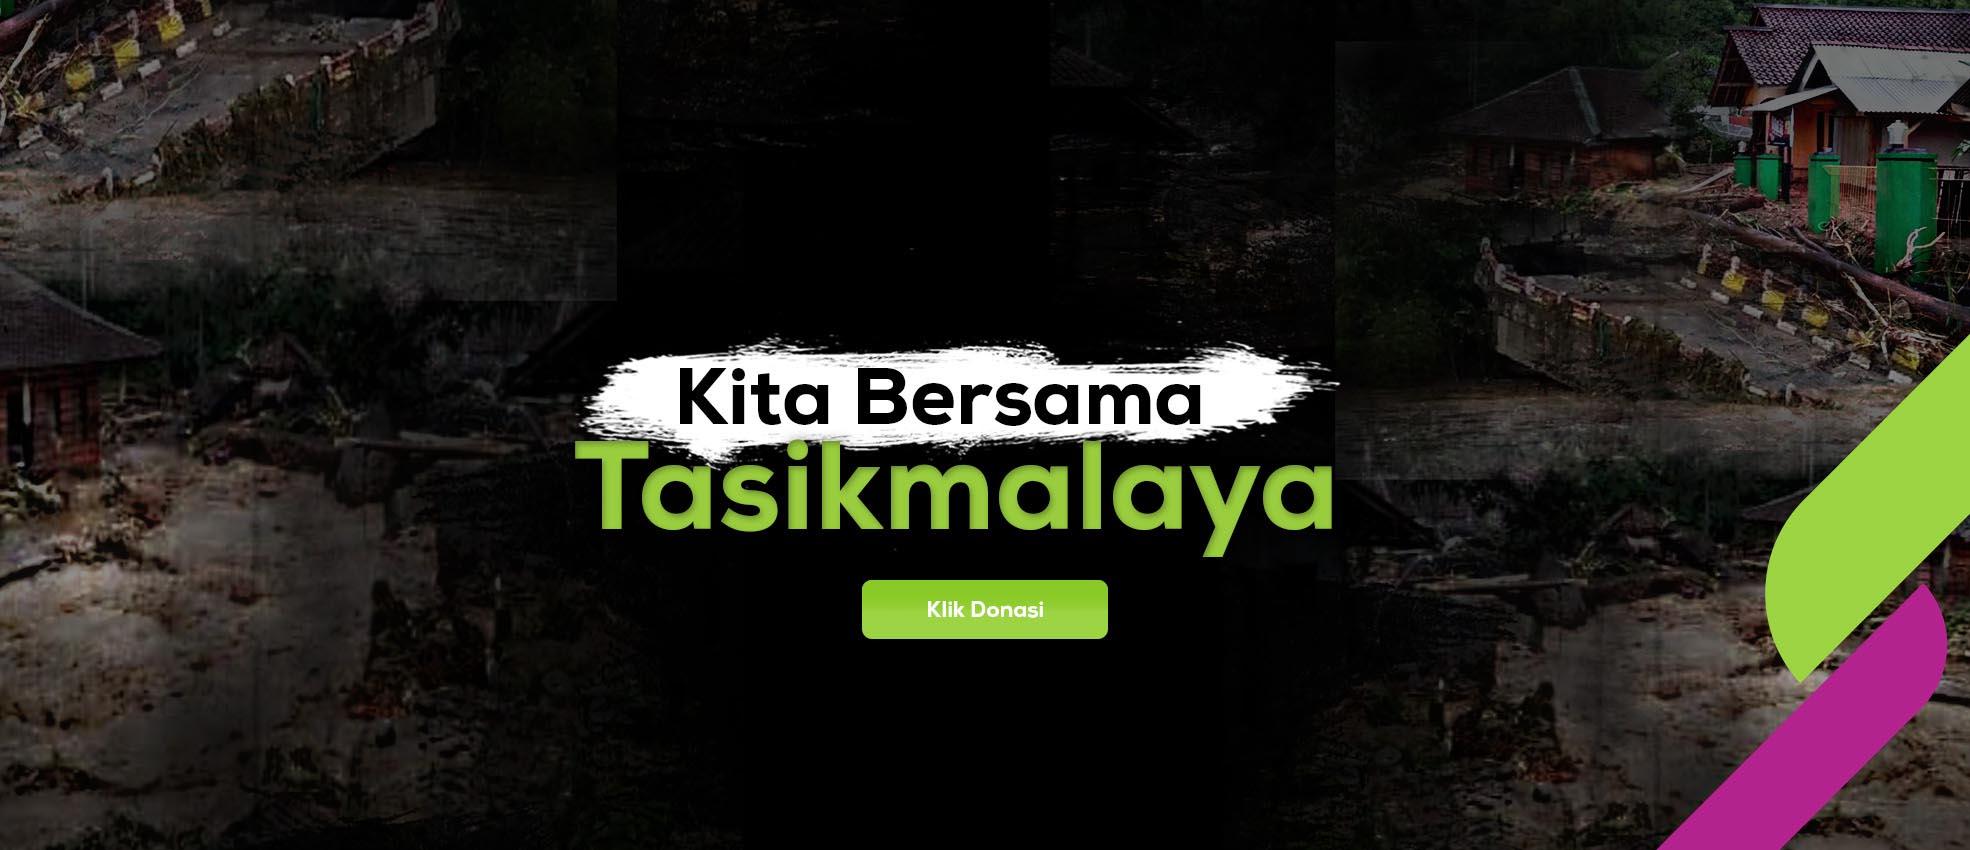 kita bersama tasikmalaya, let's help tasikmalaya, banjir tasik, sinergi foundation